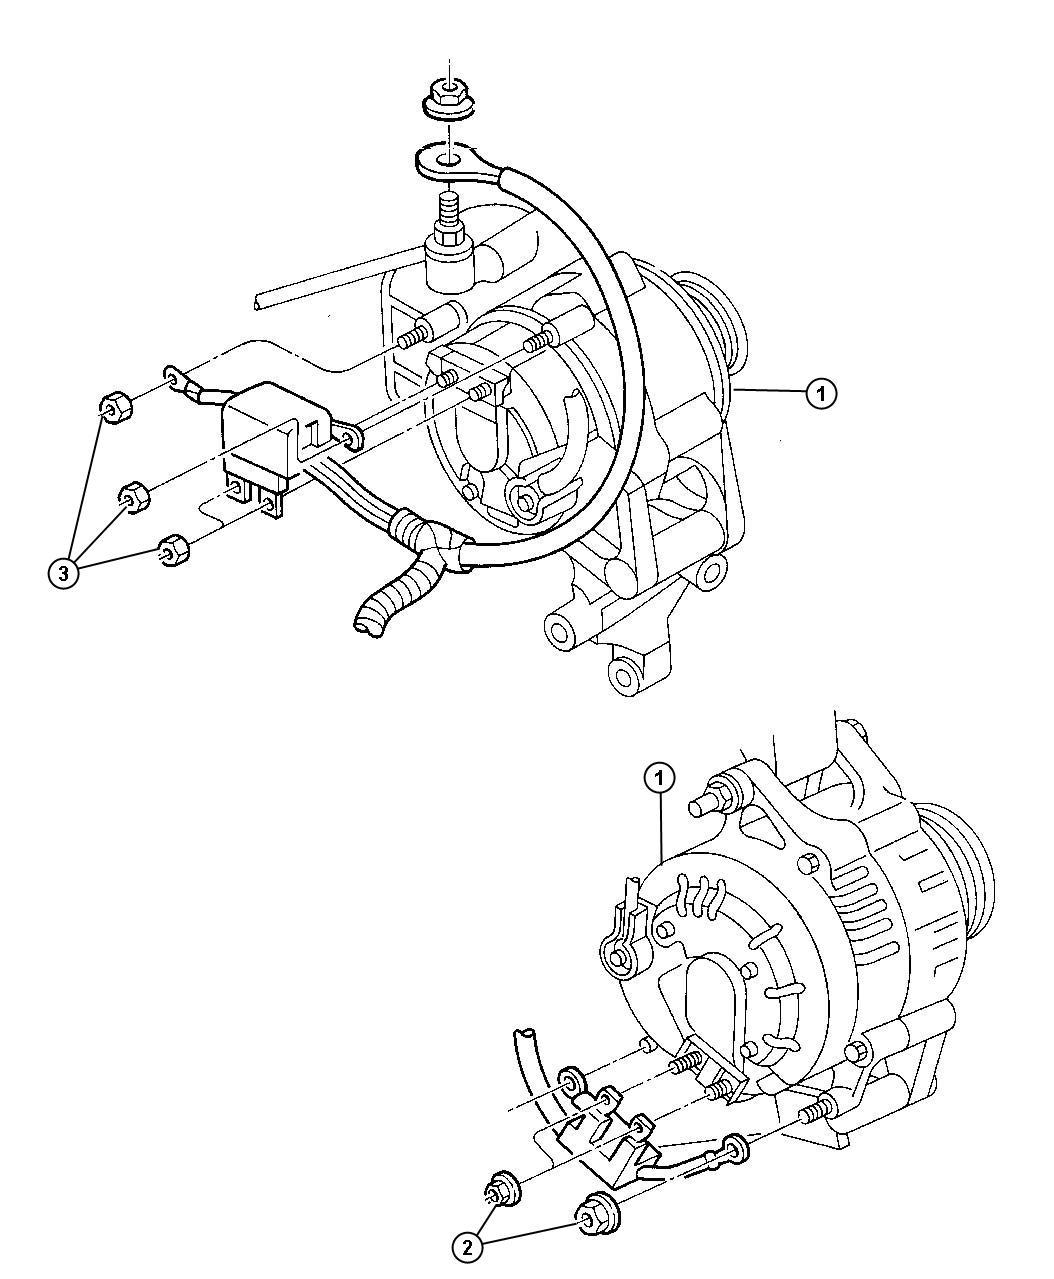 2013 Chrysler 200 Alternatr. Engine. [117 amp alternator